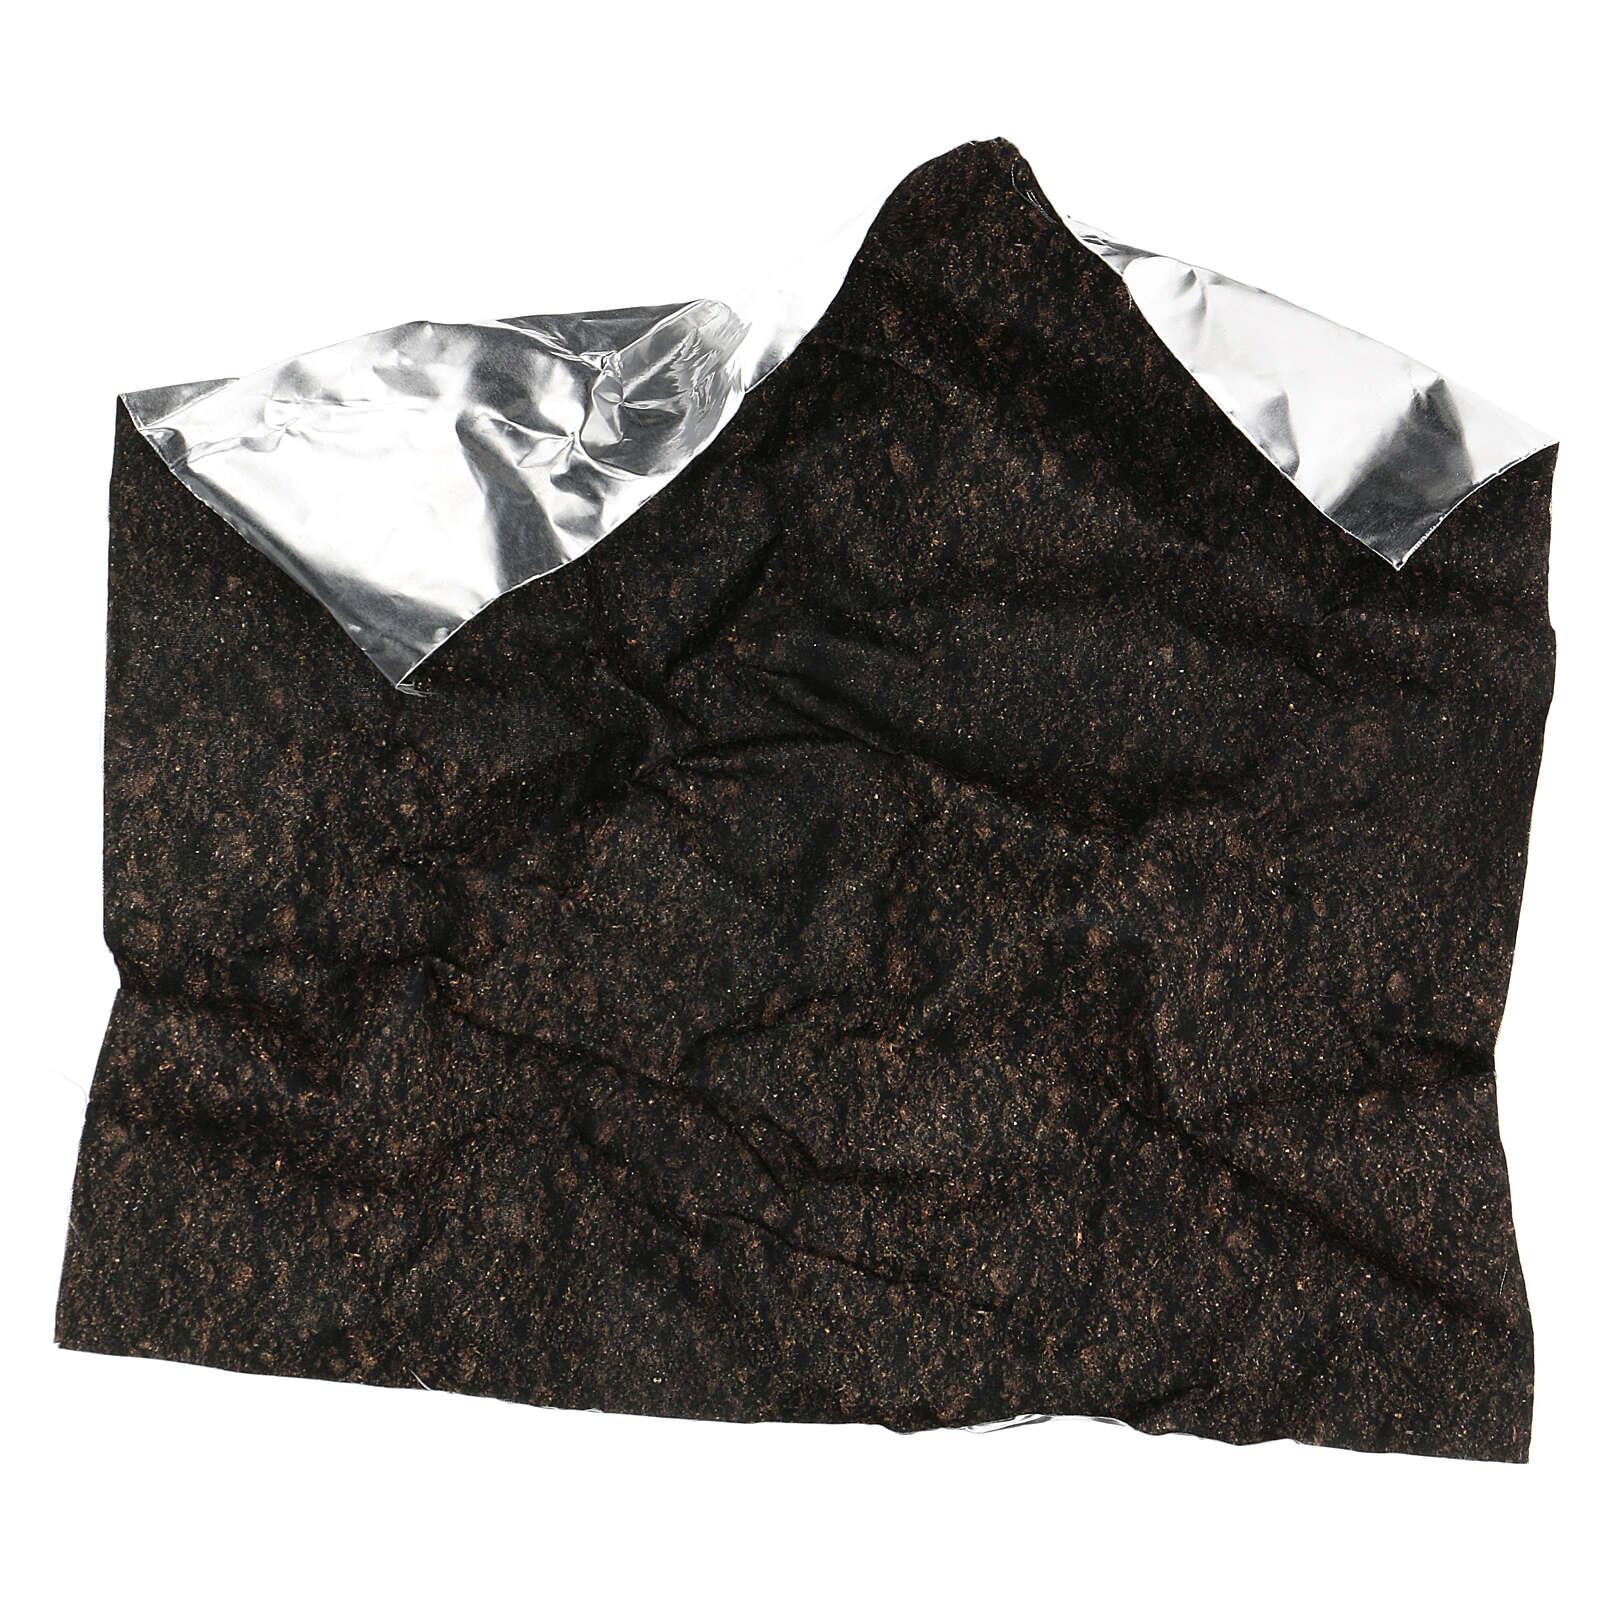 Dark soil paper shapeable 30x30 cm for nativity scenes 4